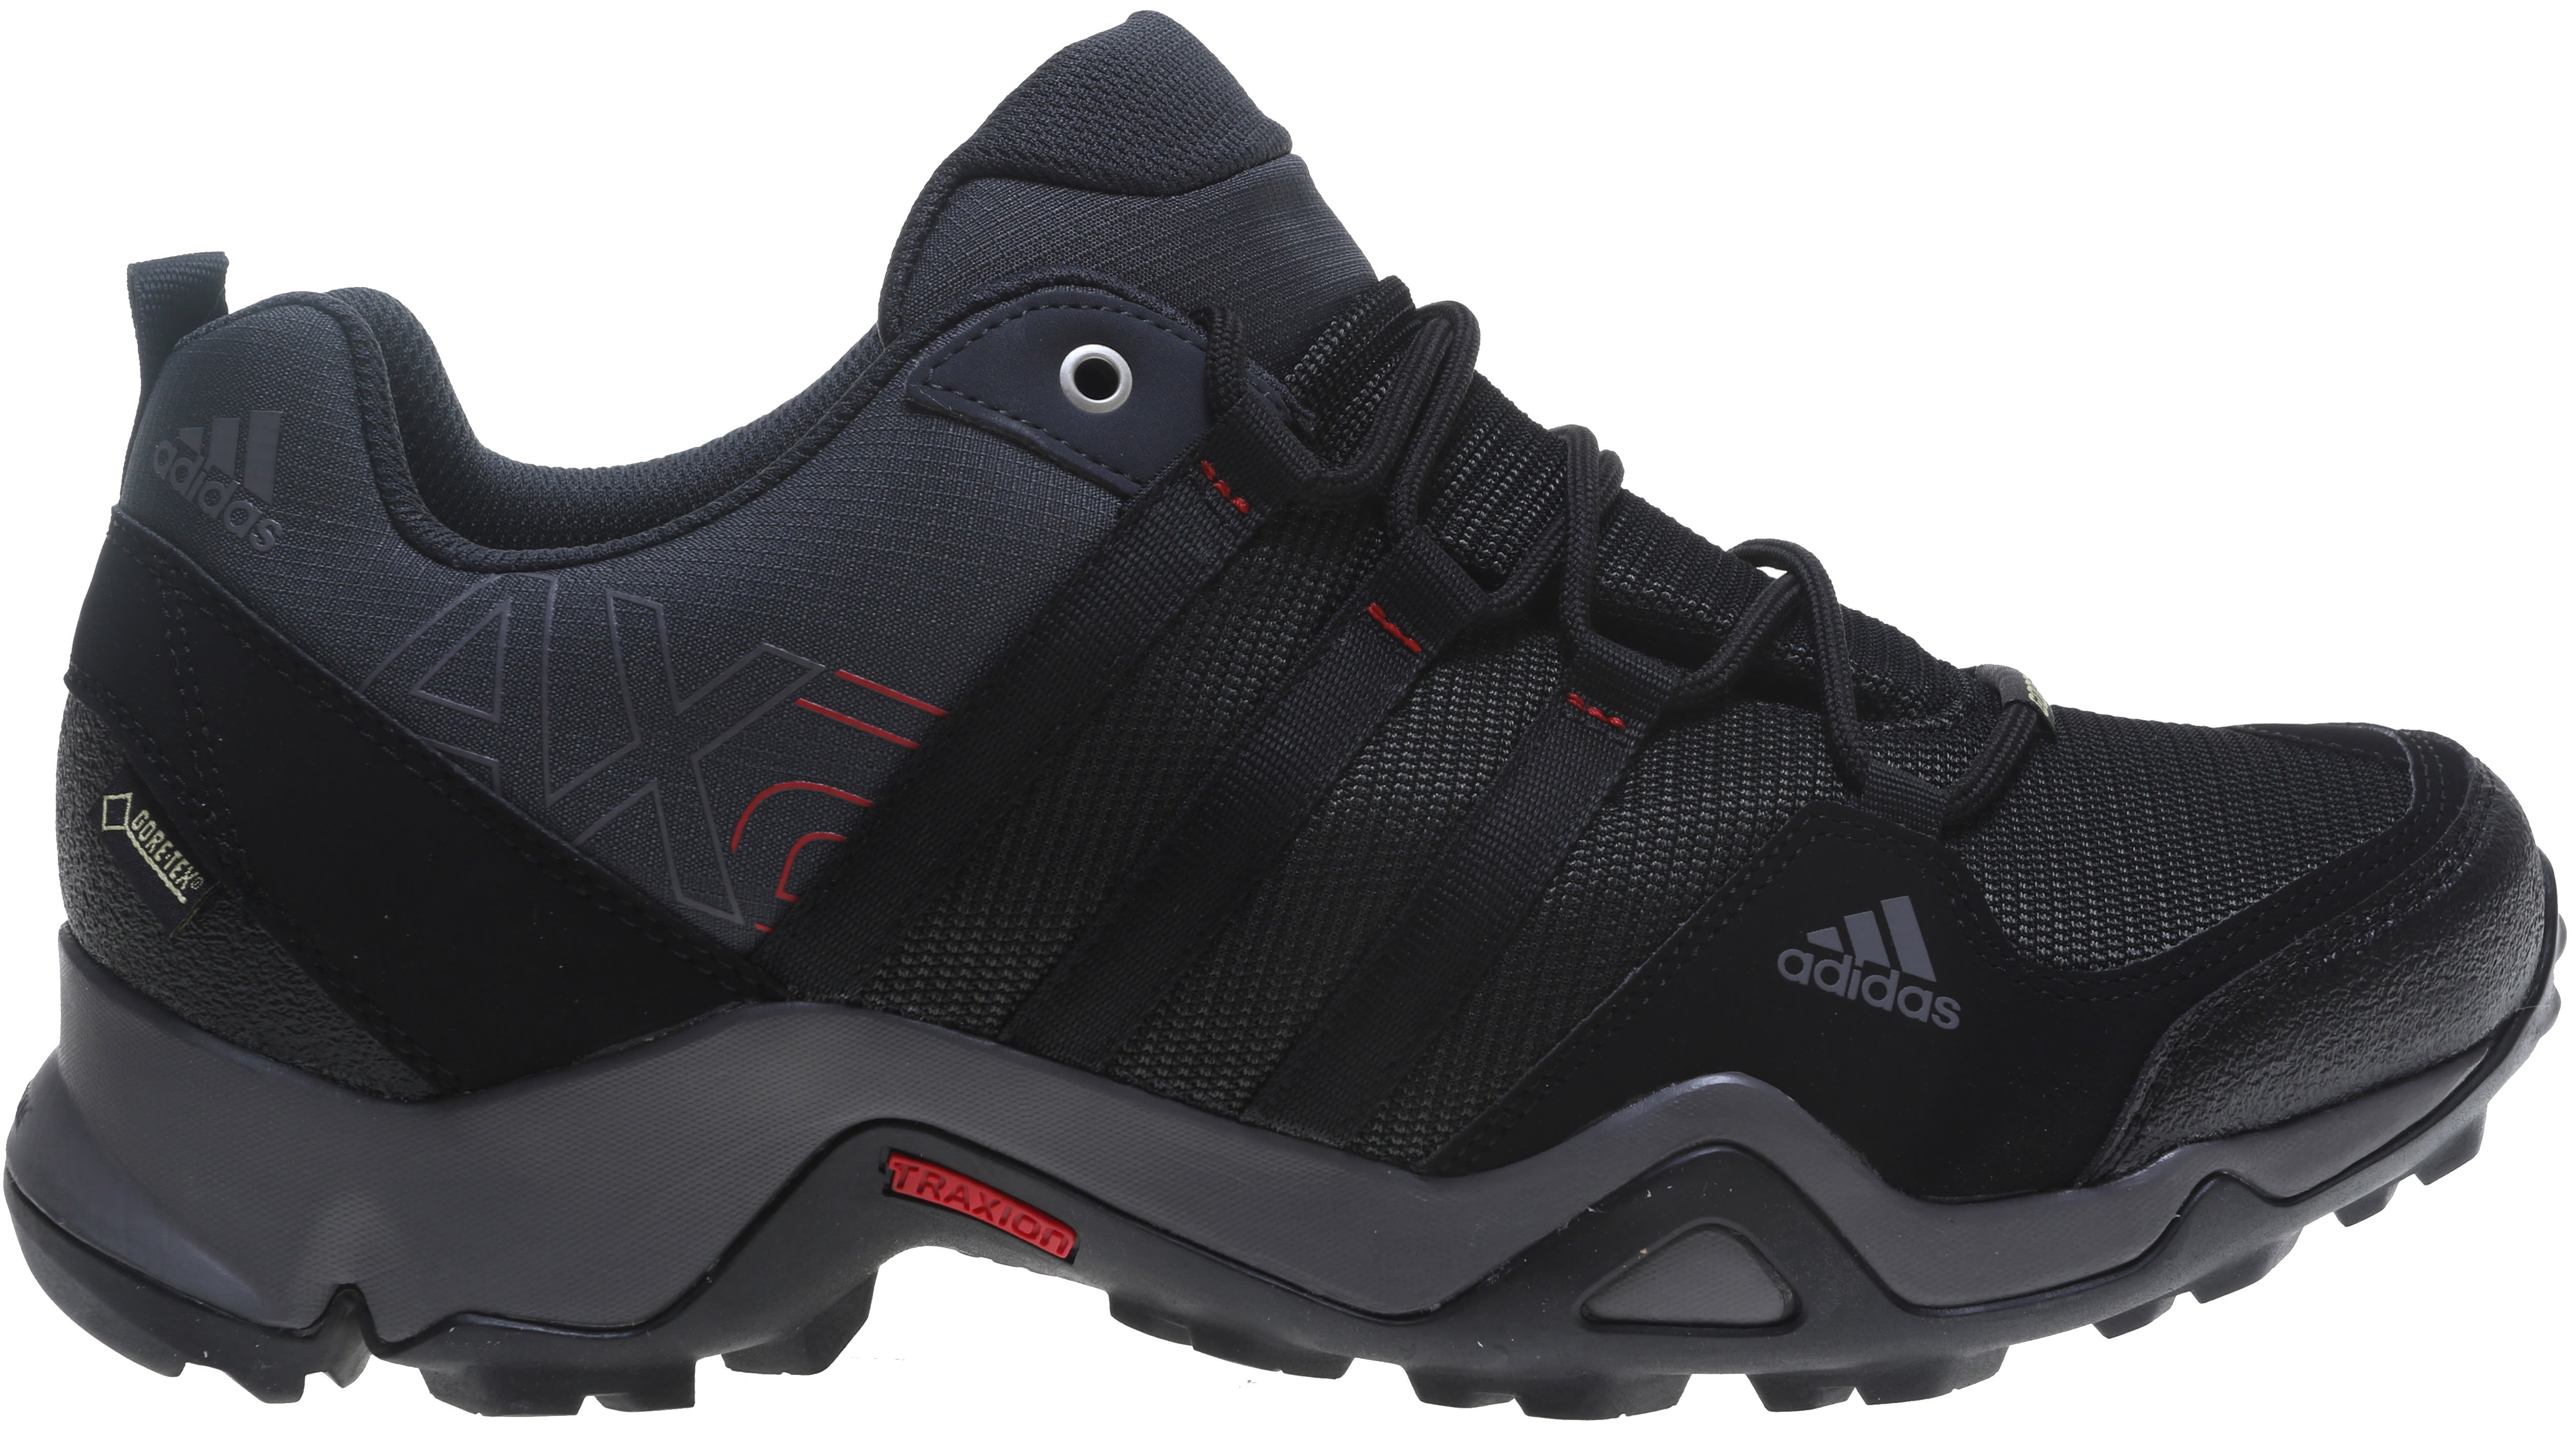 Adidas AX2 Gore-Tex Hiking Shoes